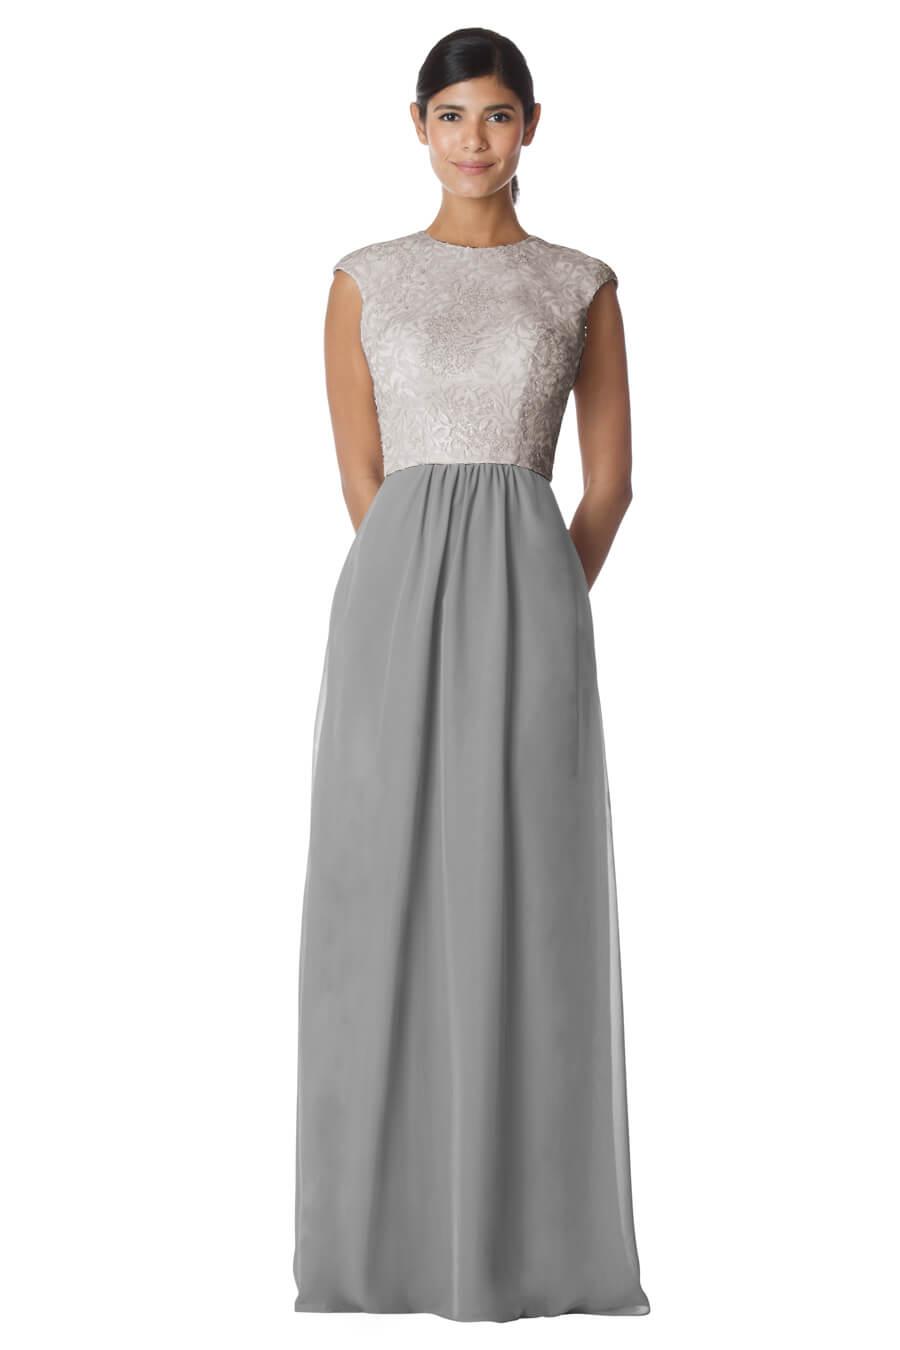 Halter Neck Evening Dresses Styles Infront